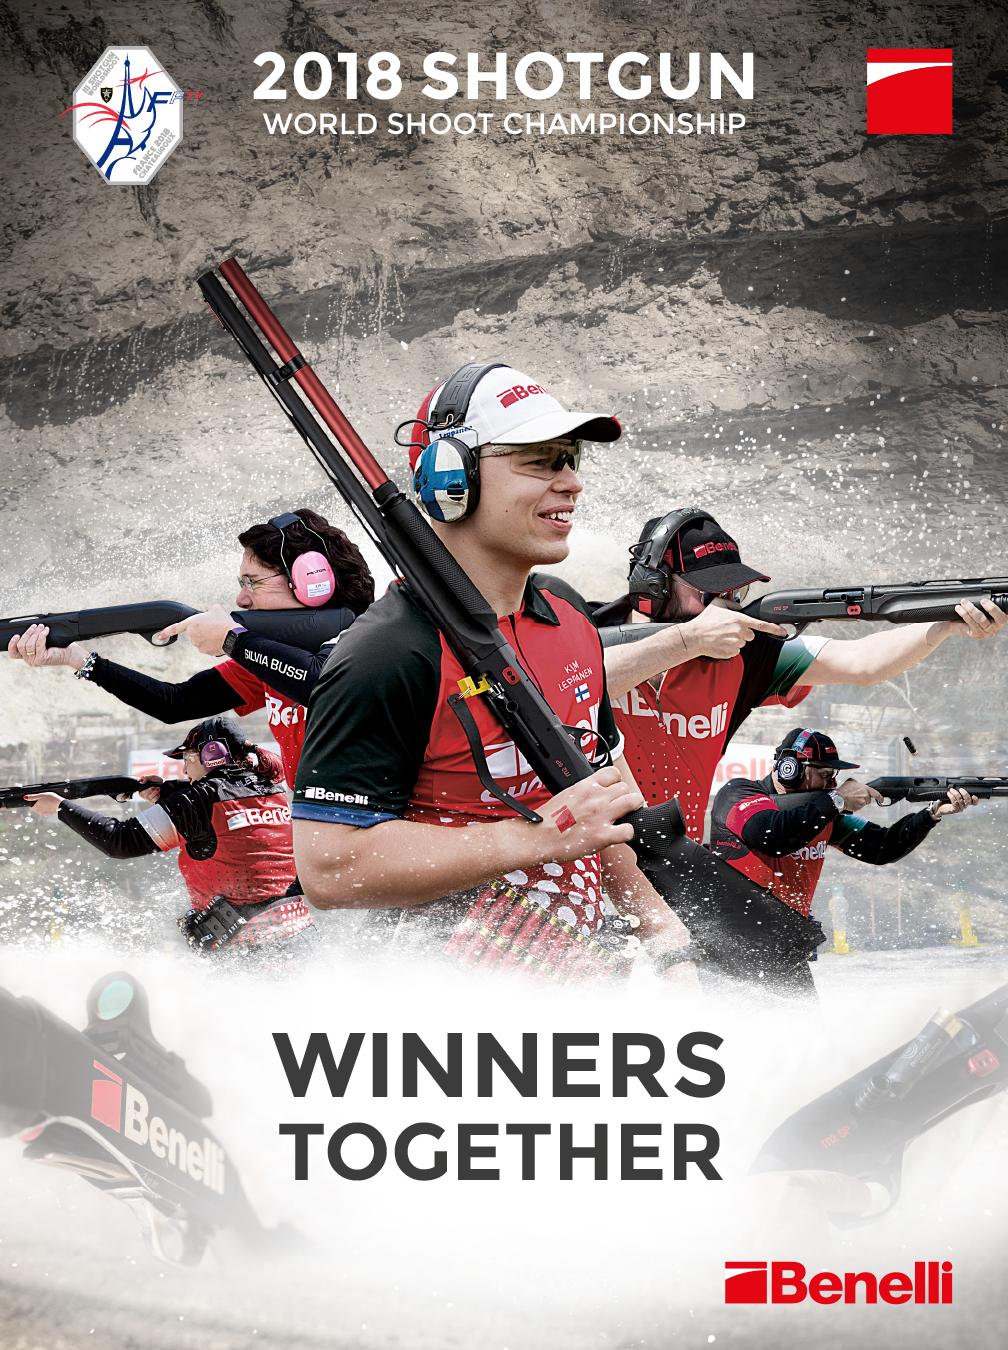 Benelli armi match sponsor mondiale I.P.S.C.